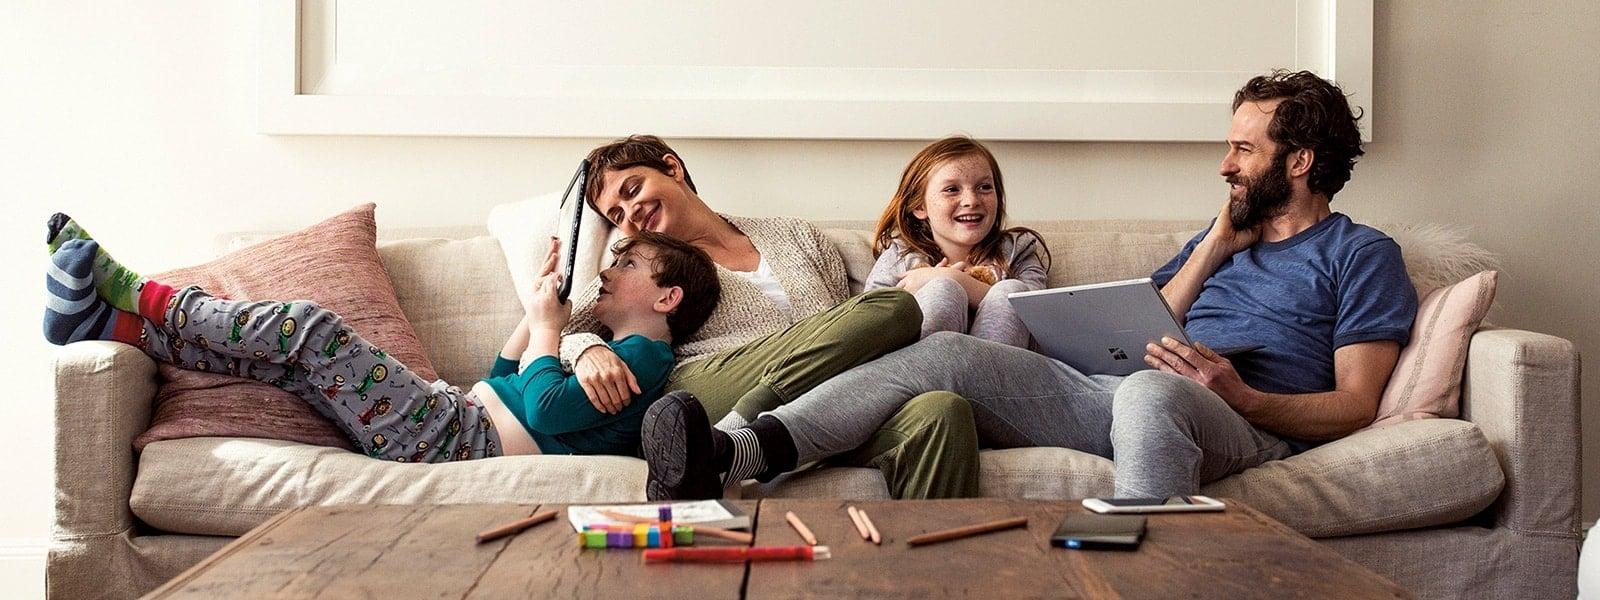 Familie som ligger på sofaen